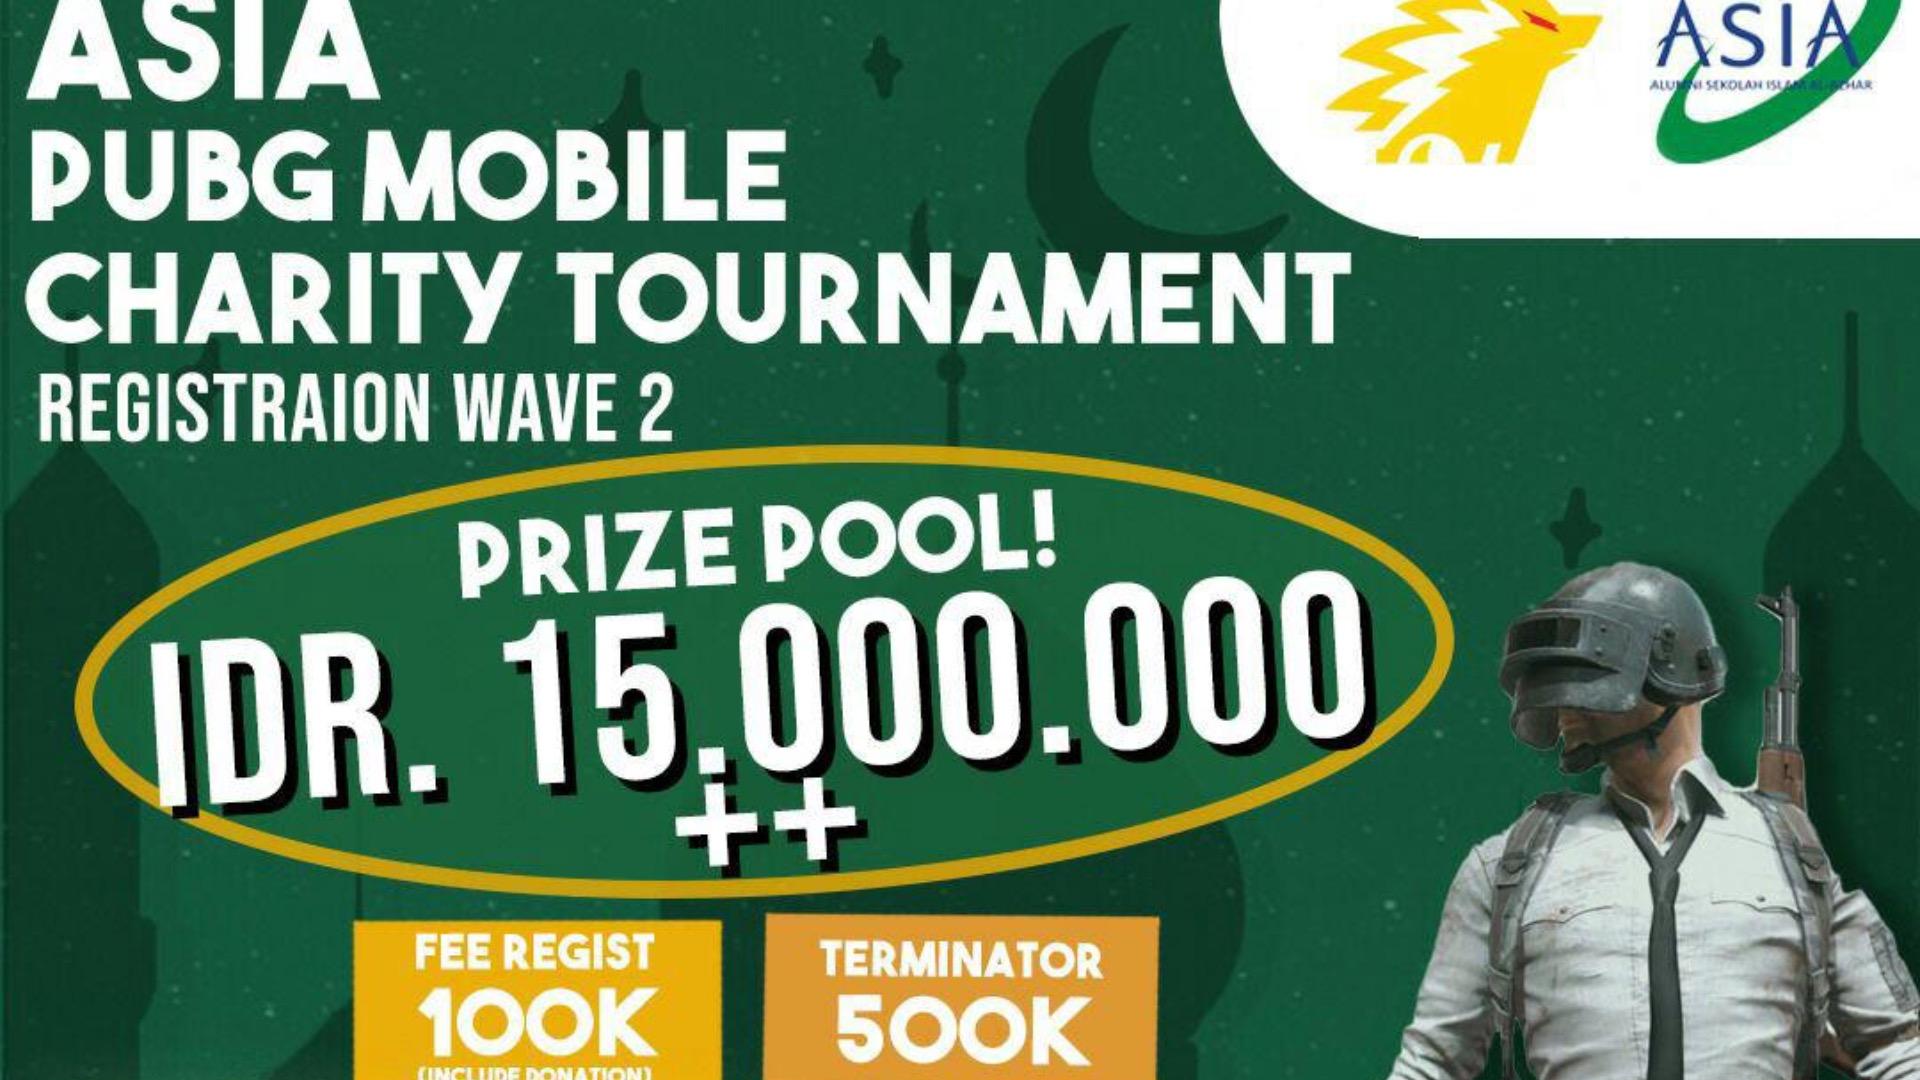 ASIA PUBGM Charity Tournament 2021